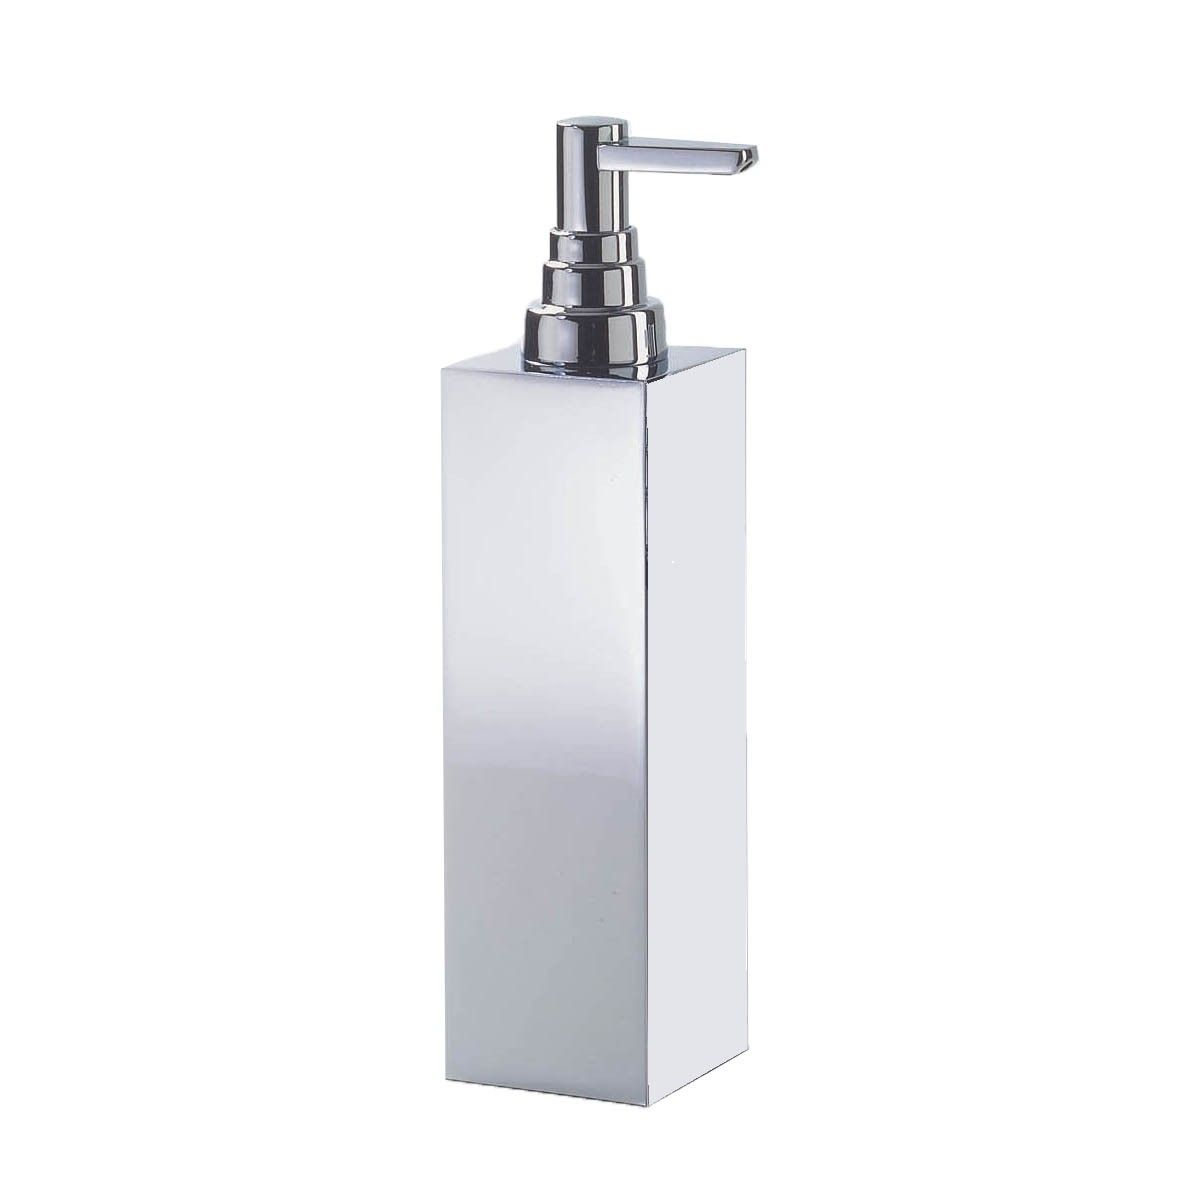 Harmony 407b Free Standing Soap Dispenser In Chrome Or Nickel